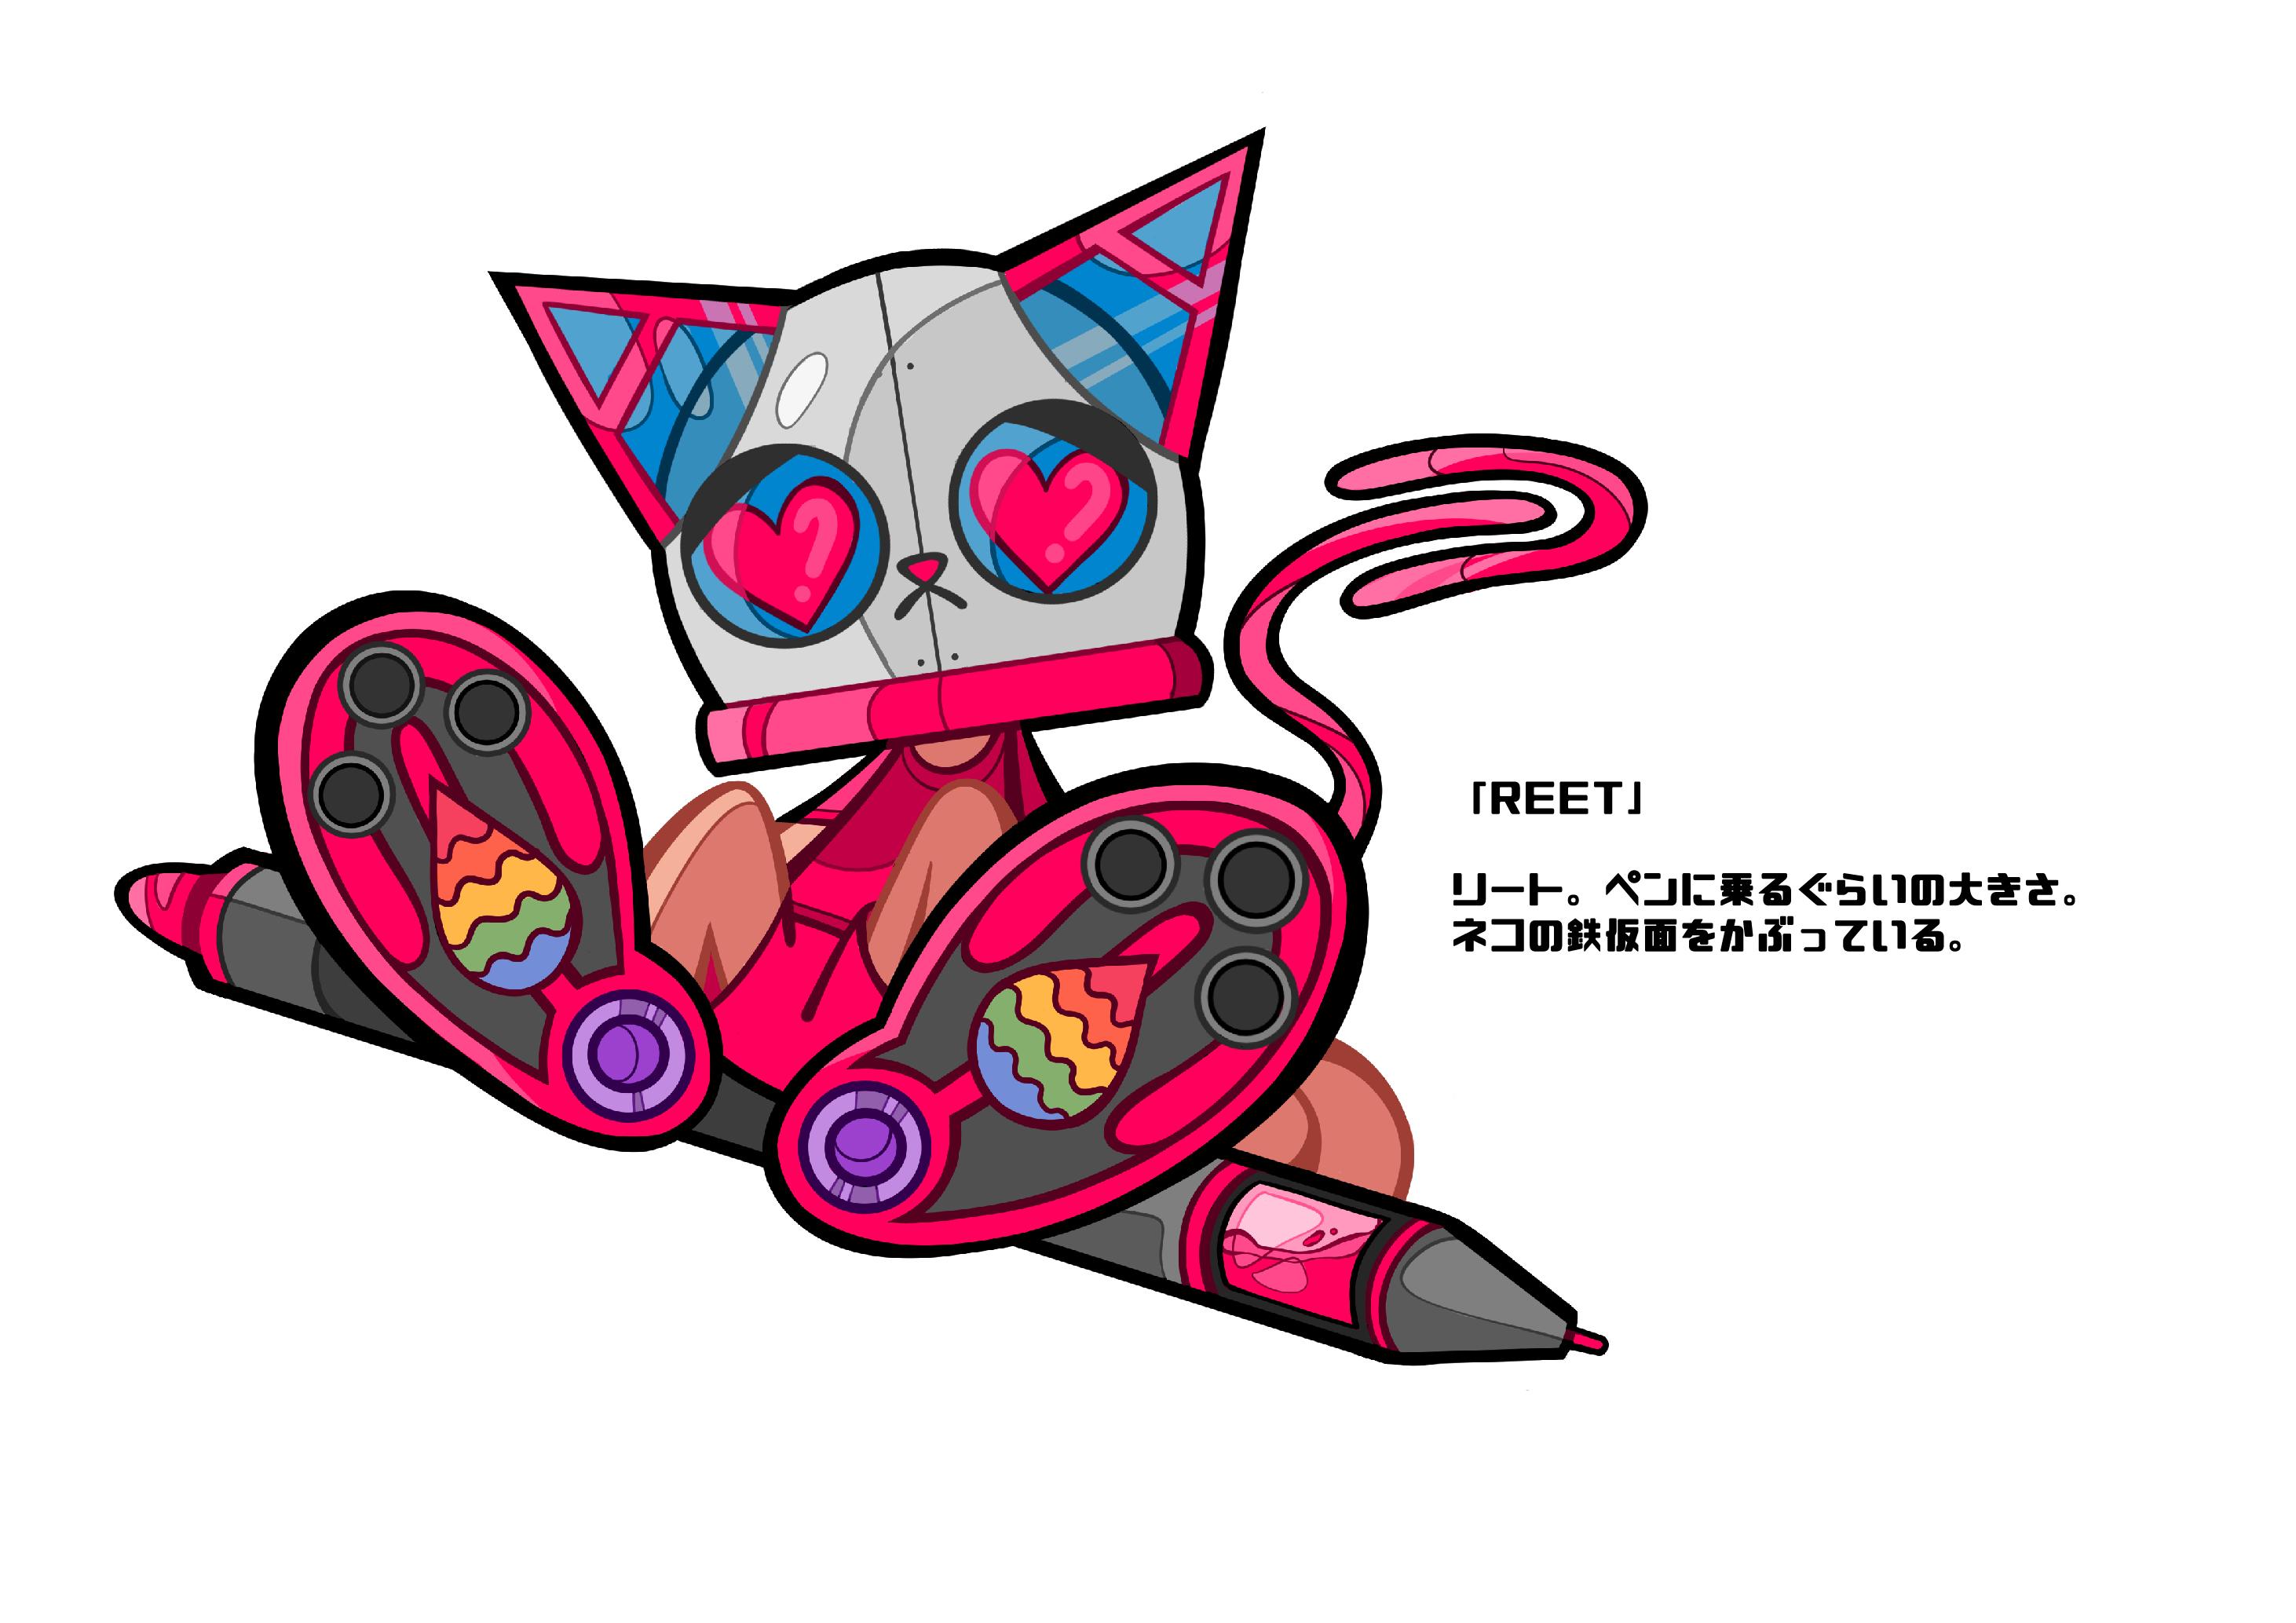 ART streetイメージキャラクター候補「REET」/Beliko